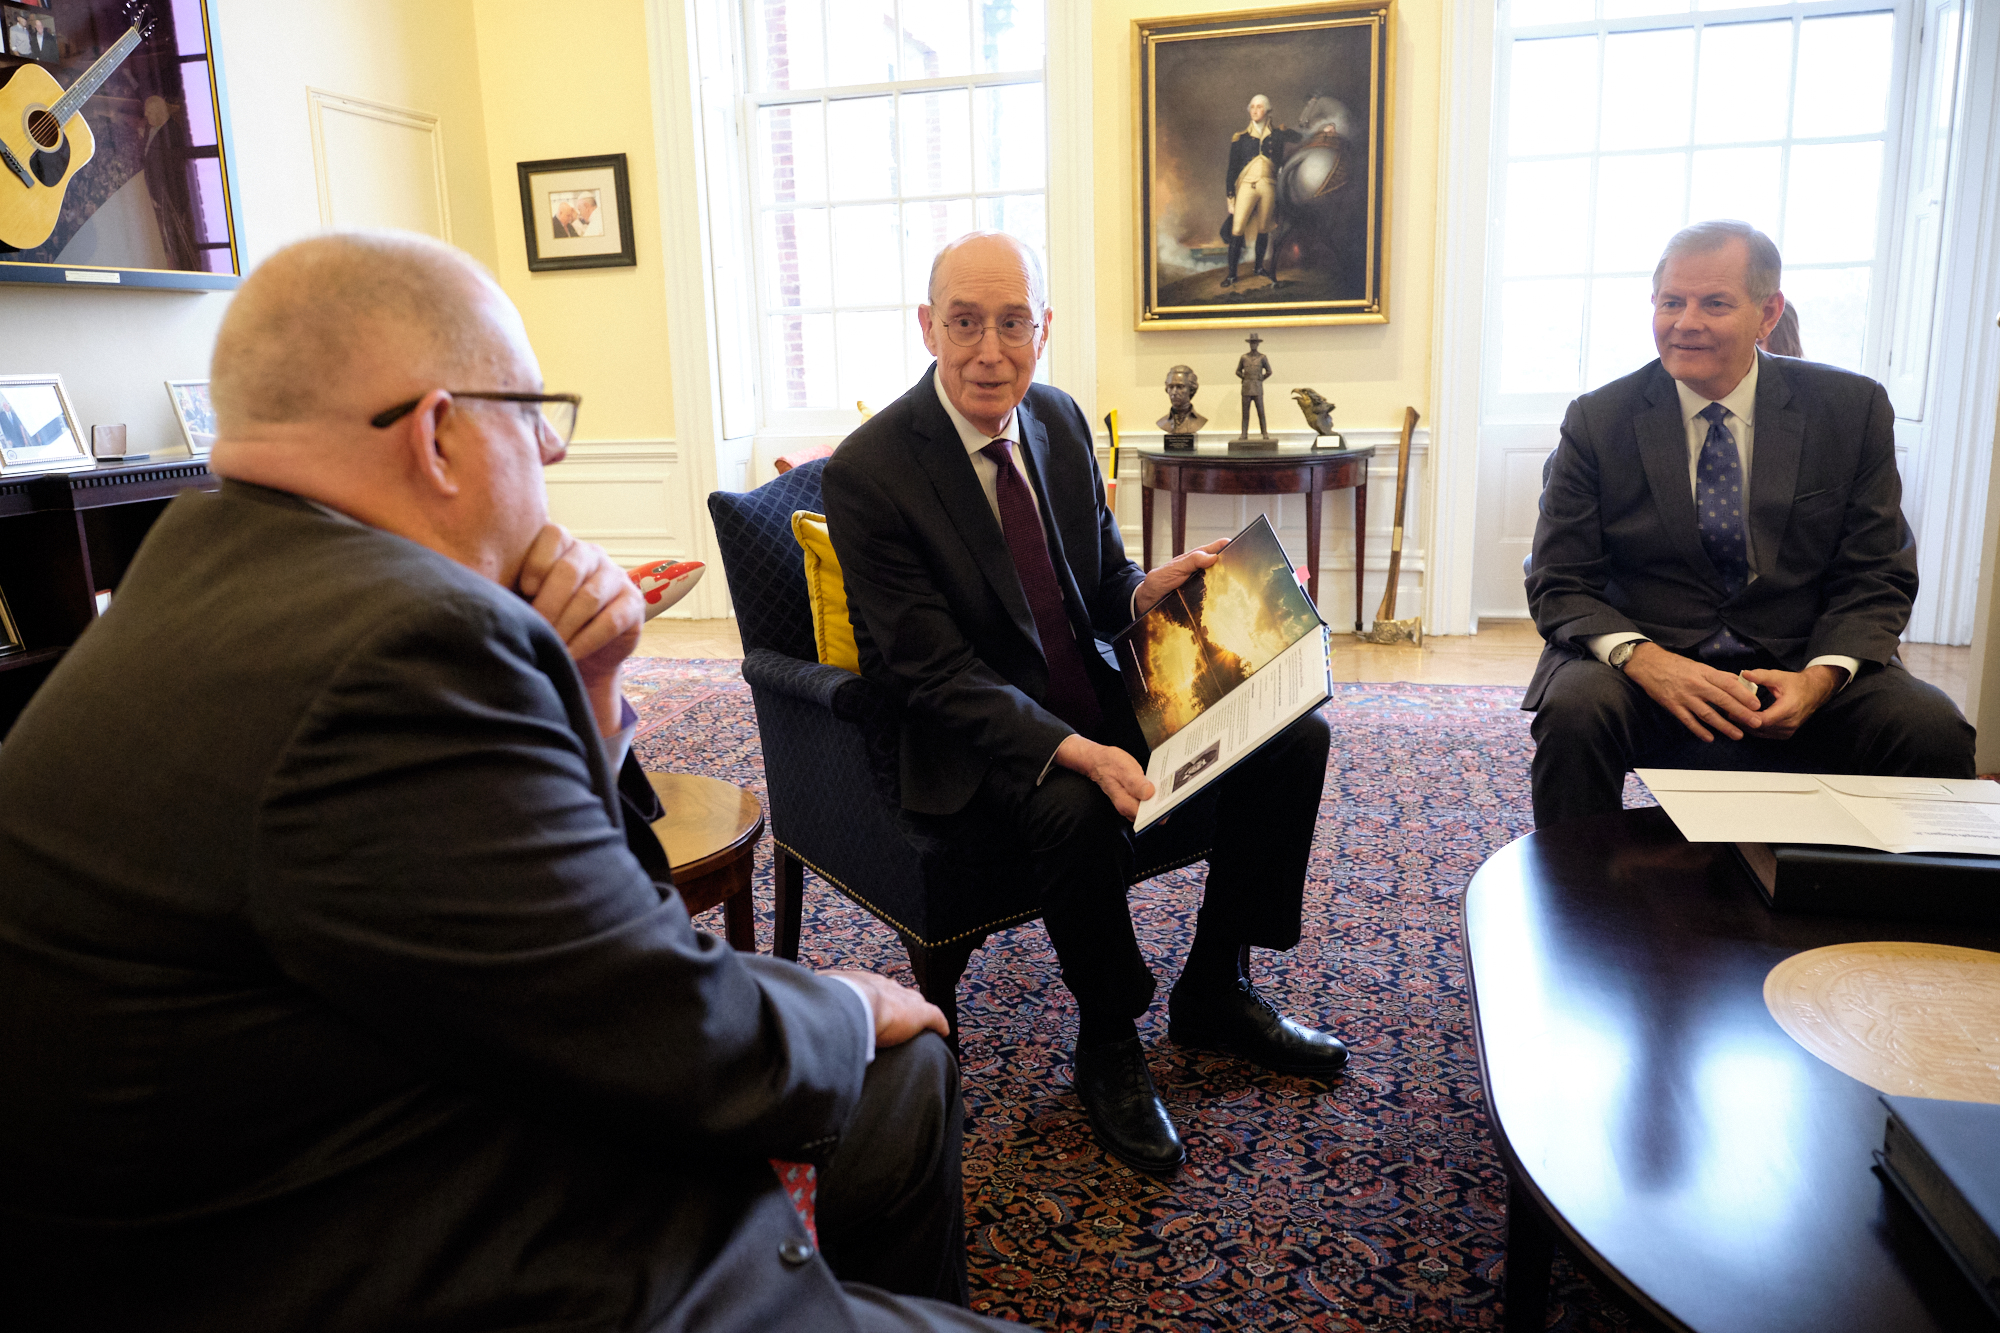 President Henry B. Eyring, center, and Elder Gary E. Stevenson present a personal family history to Maryland Governor Larry Hogan on Nov. 15, 2019.